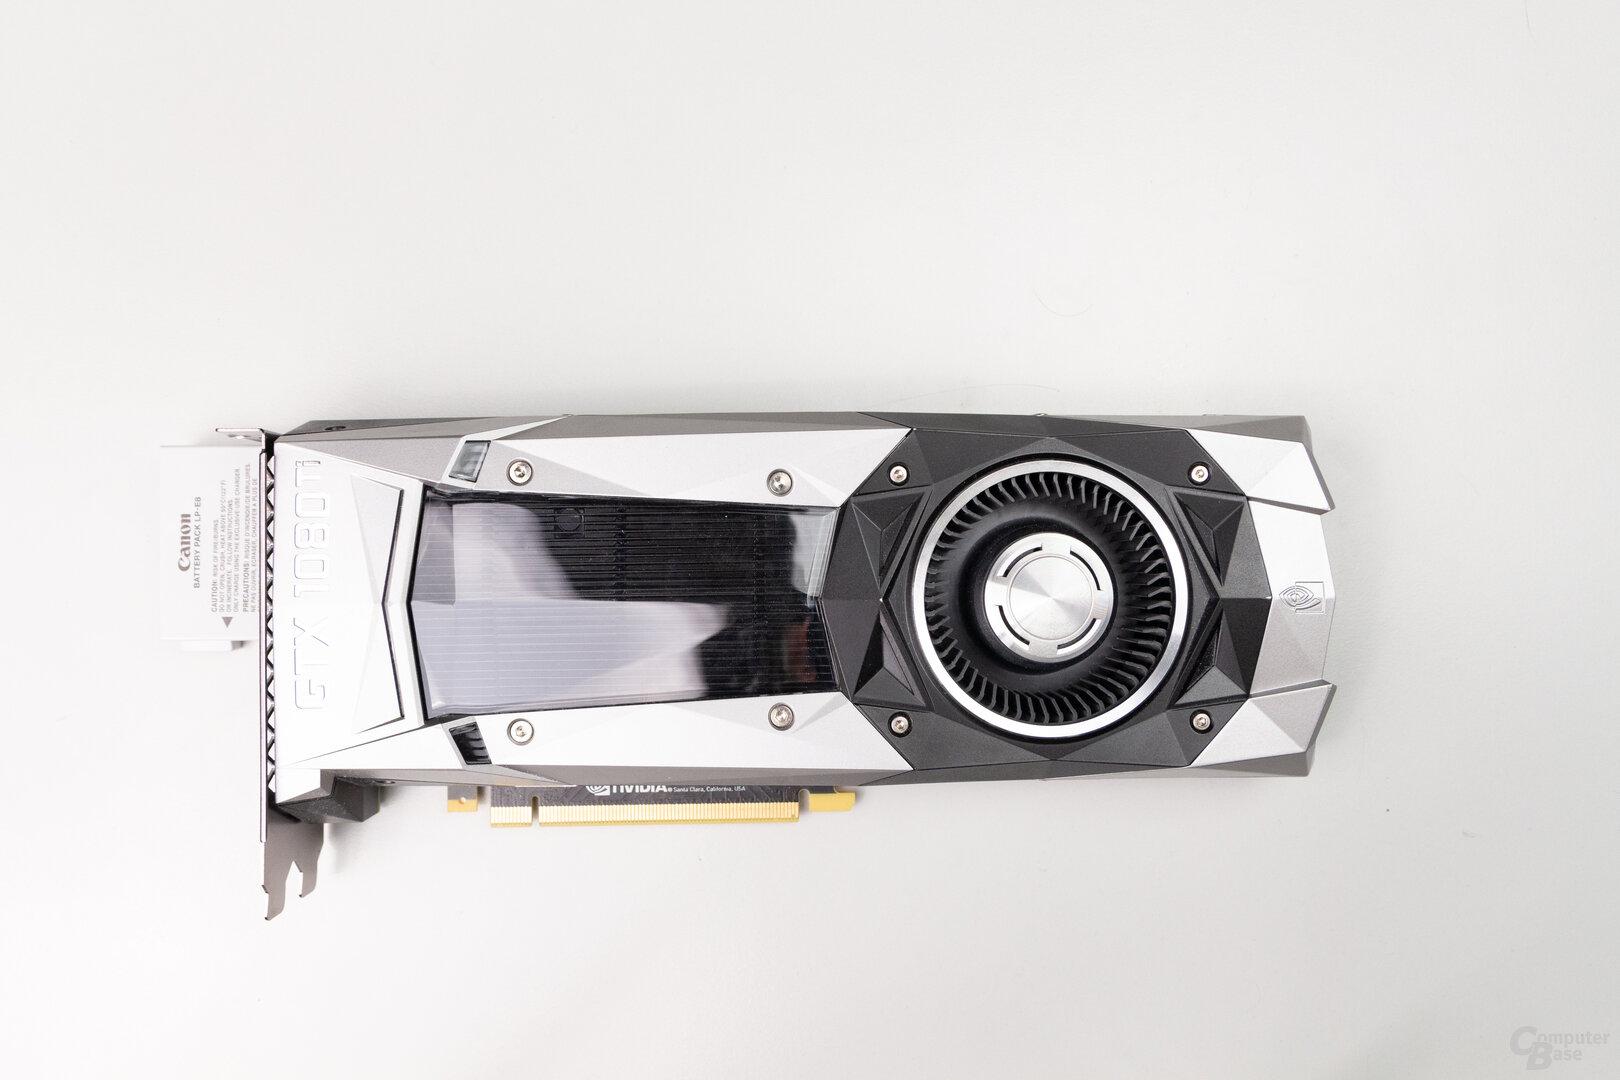 GeForce GTX 1080 Ti FE: 27,0 cm